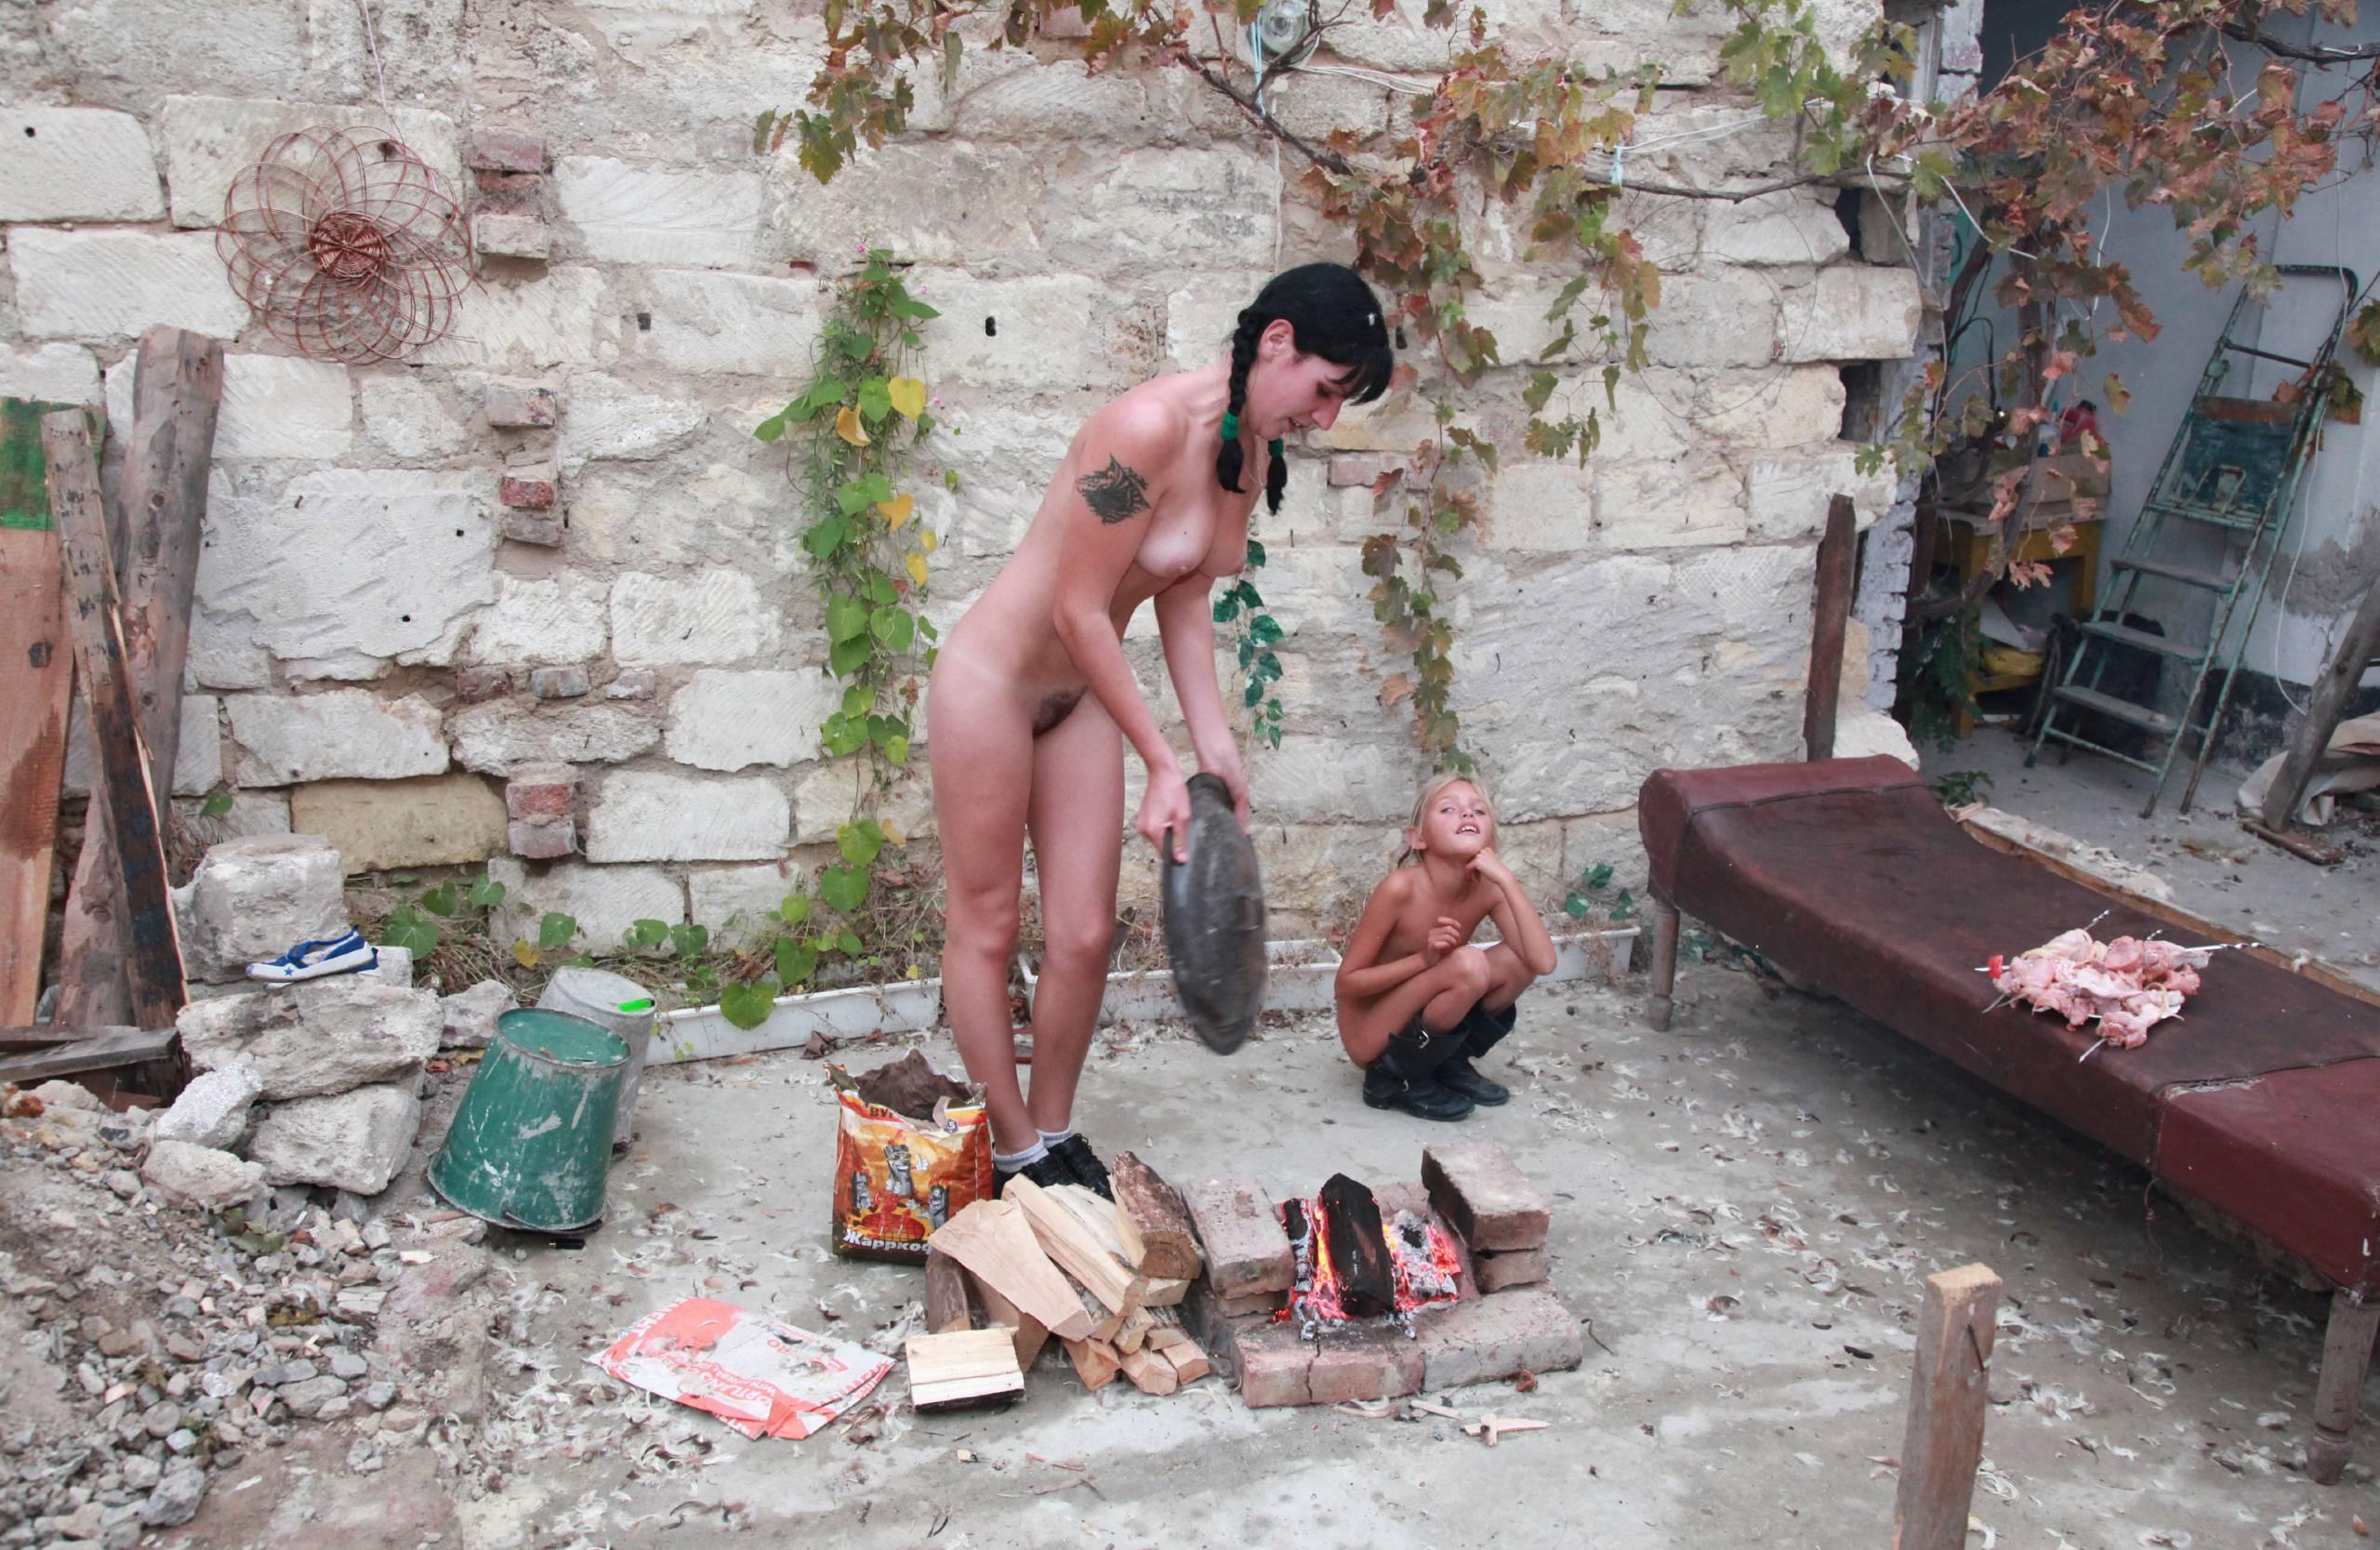 Purenudism Pics-Cozy Backyard Cookout - 2